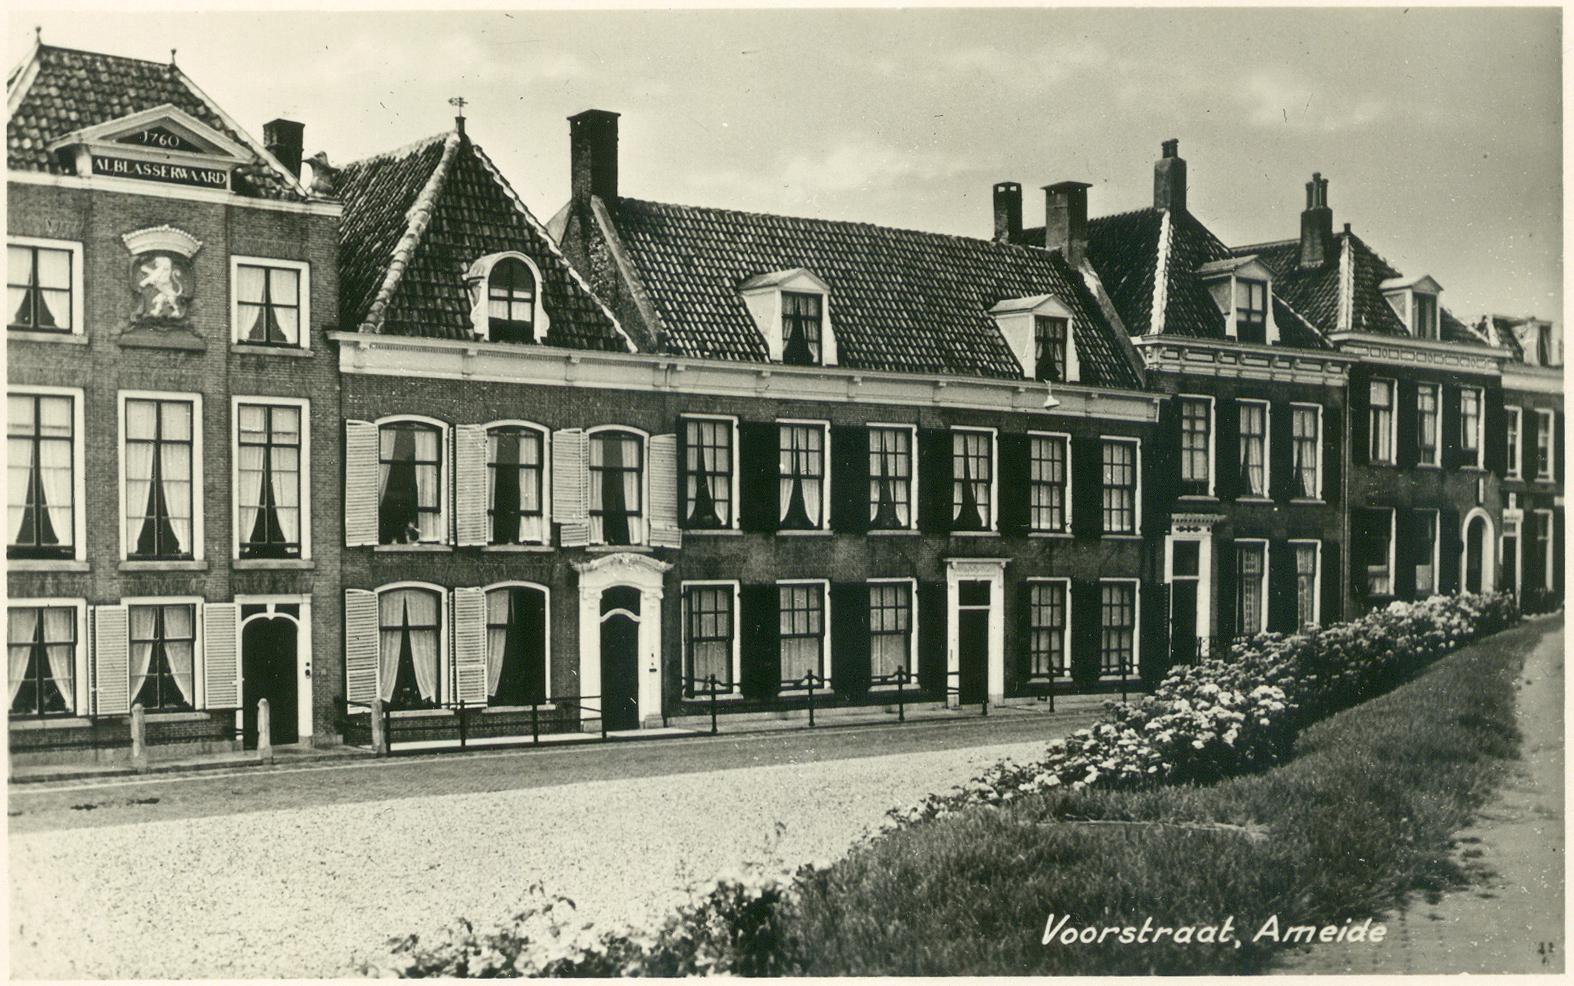 Ameide_Voorstraat_010